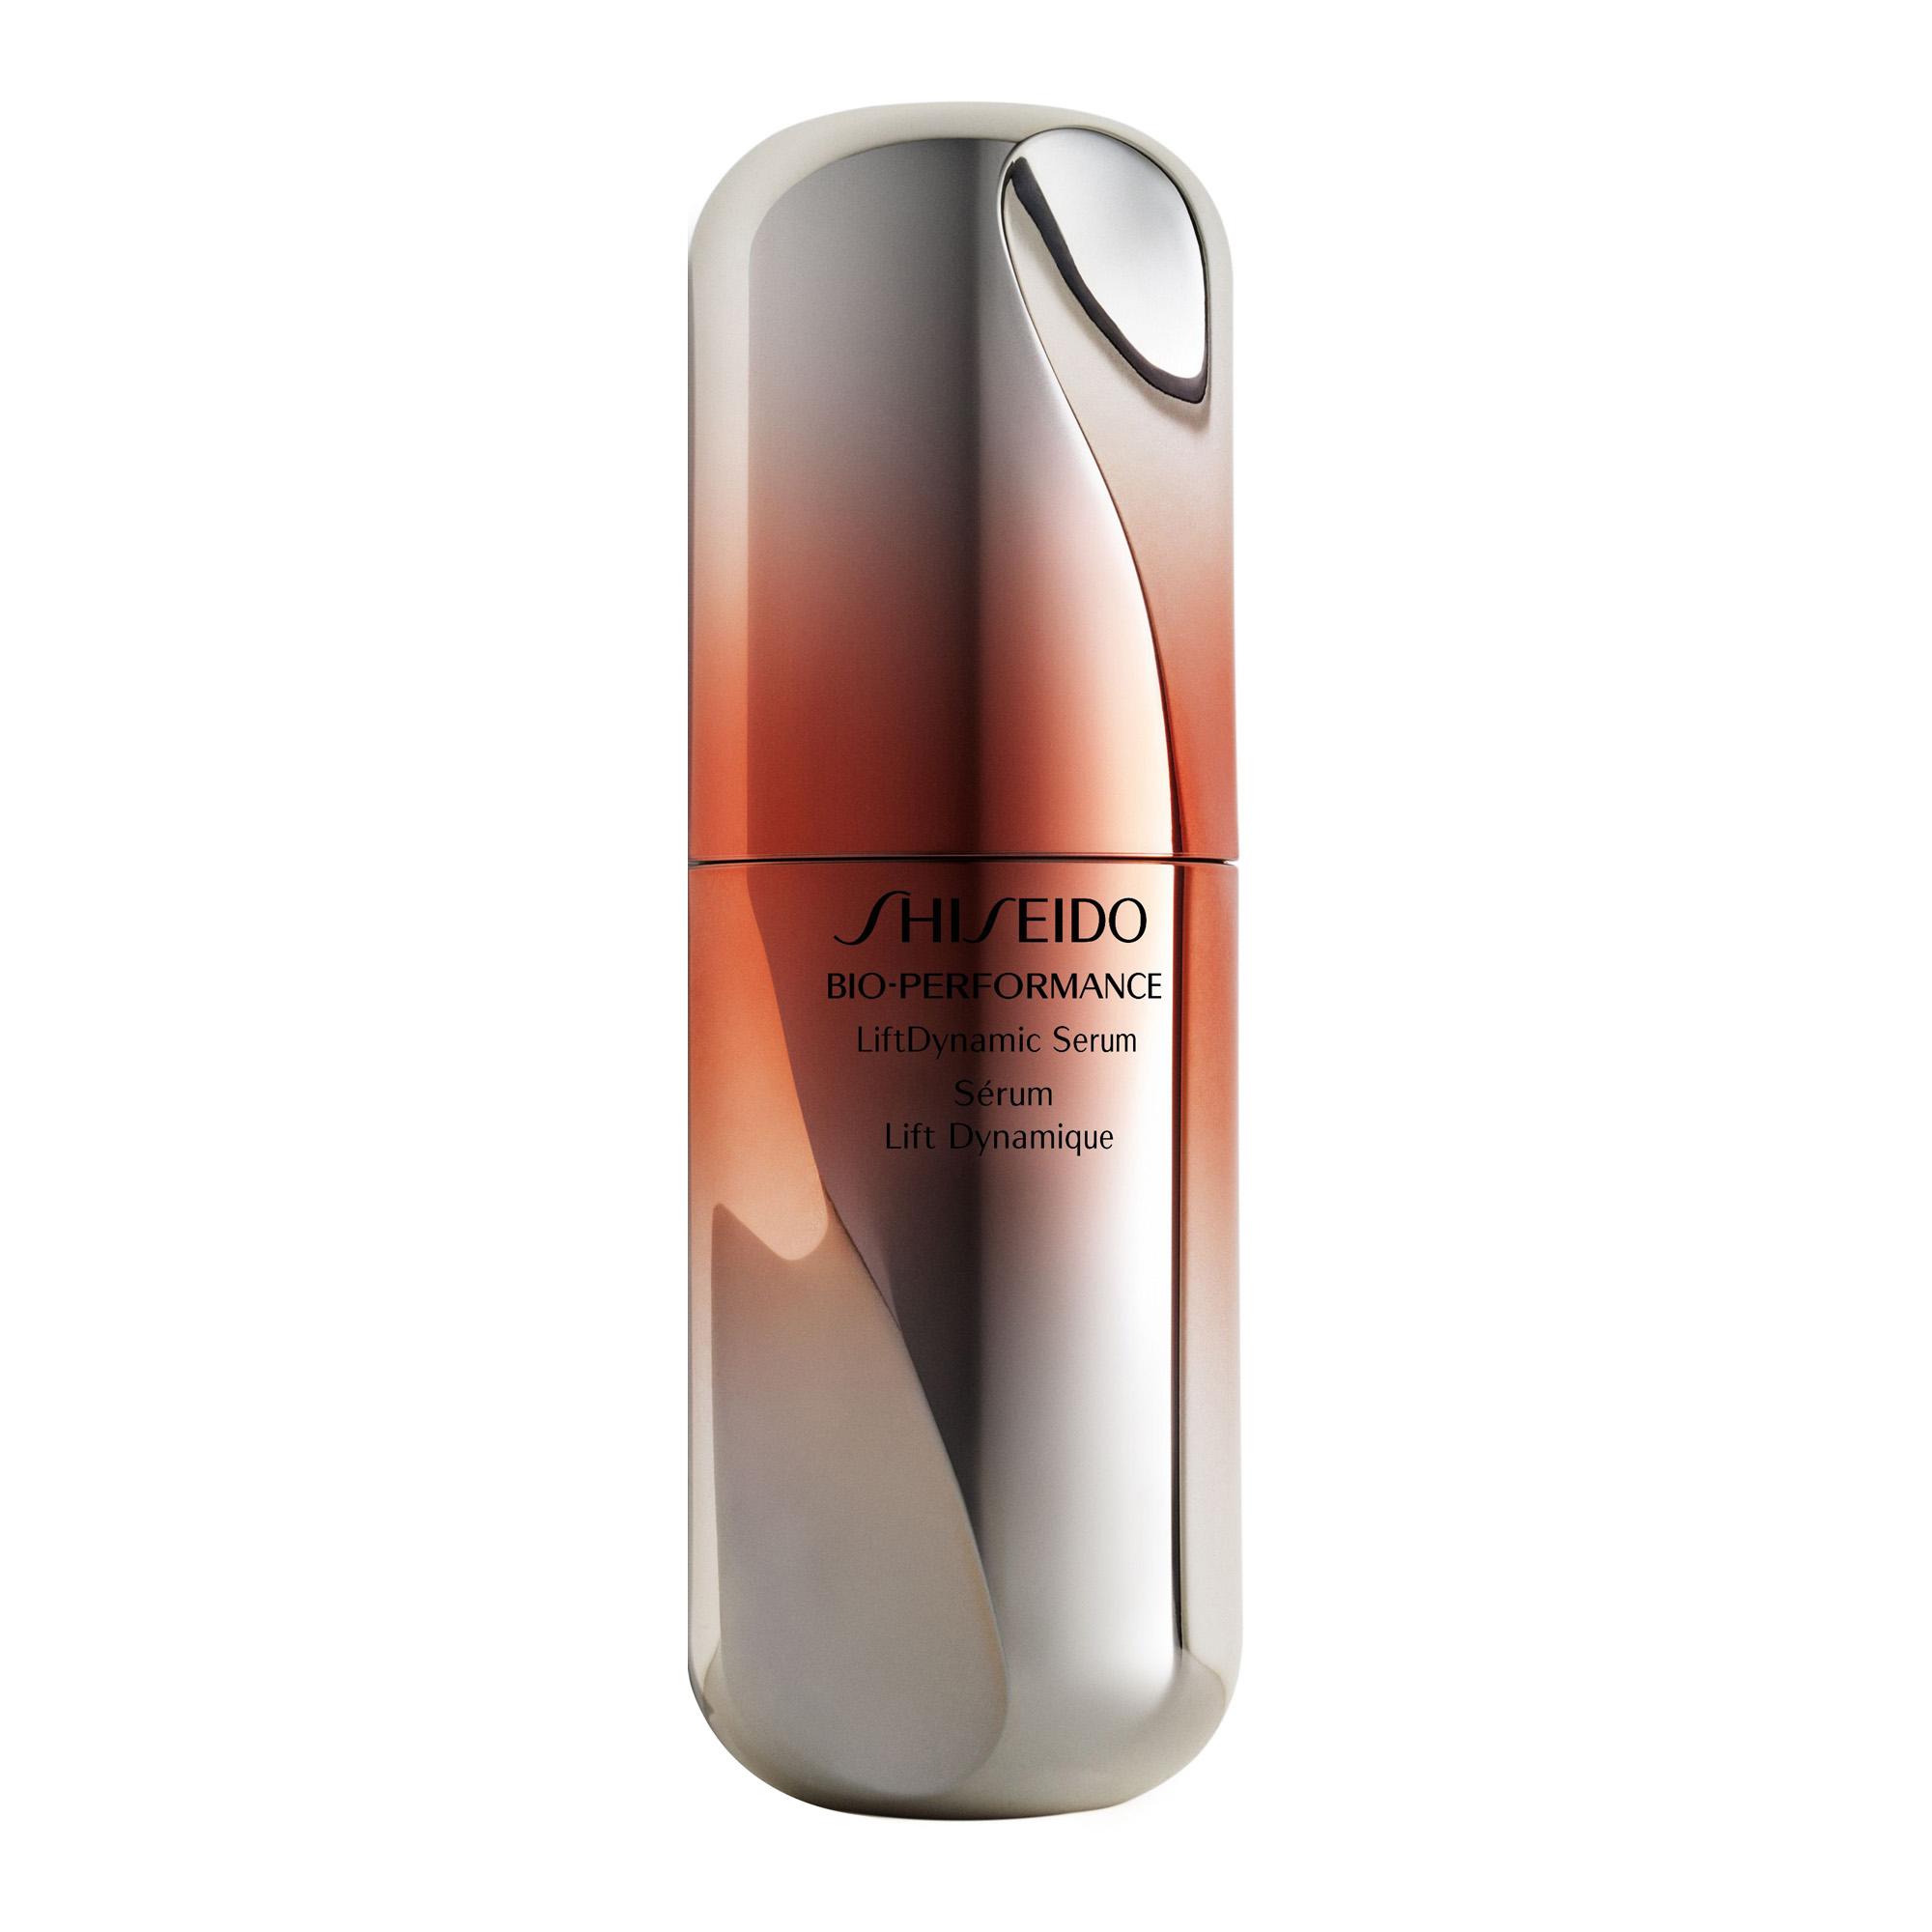 Shiseido  Bioperformance liftdynamic serum  siero 30 ml